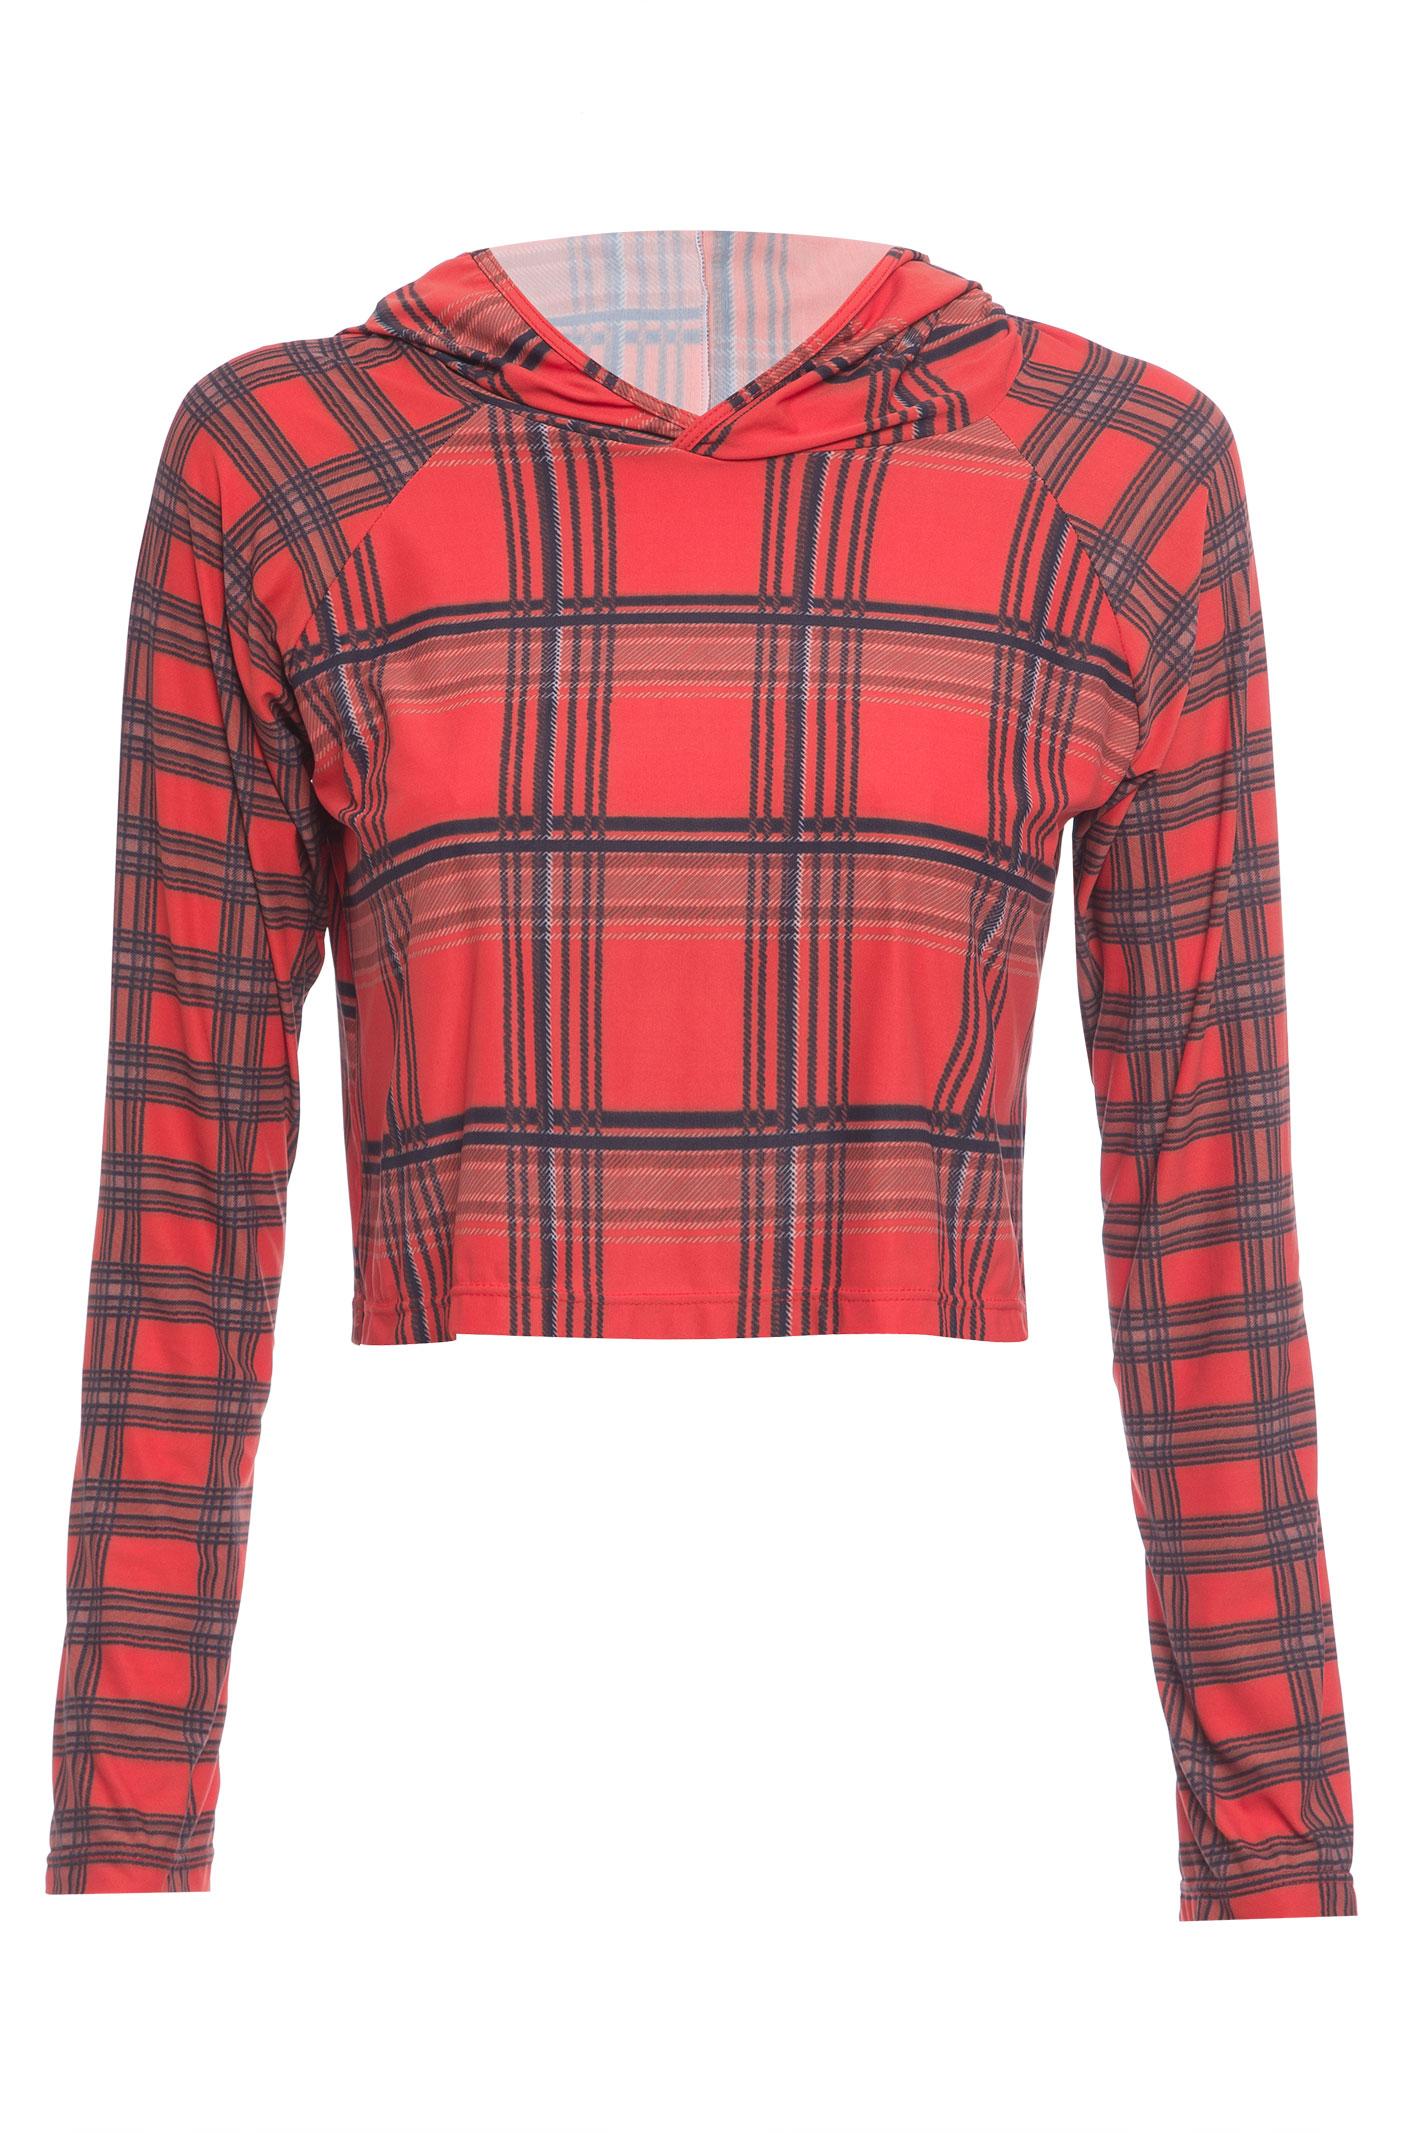 Camiseta Manga Longa Com Capuz - Laranja